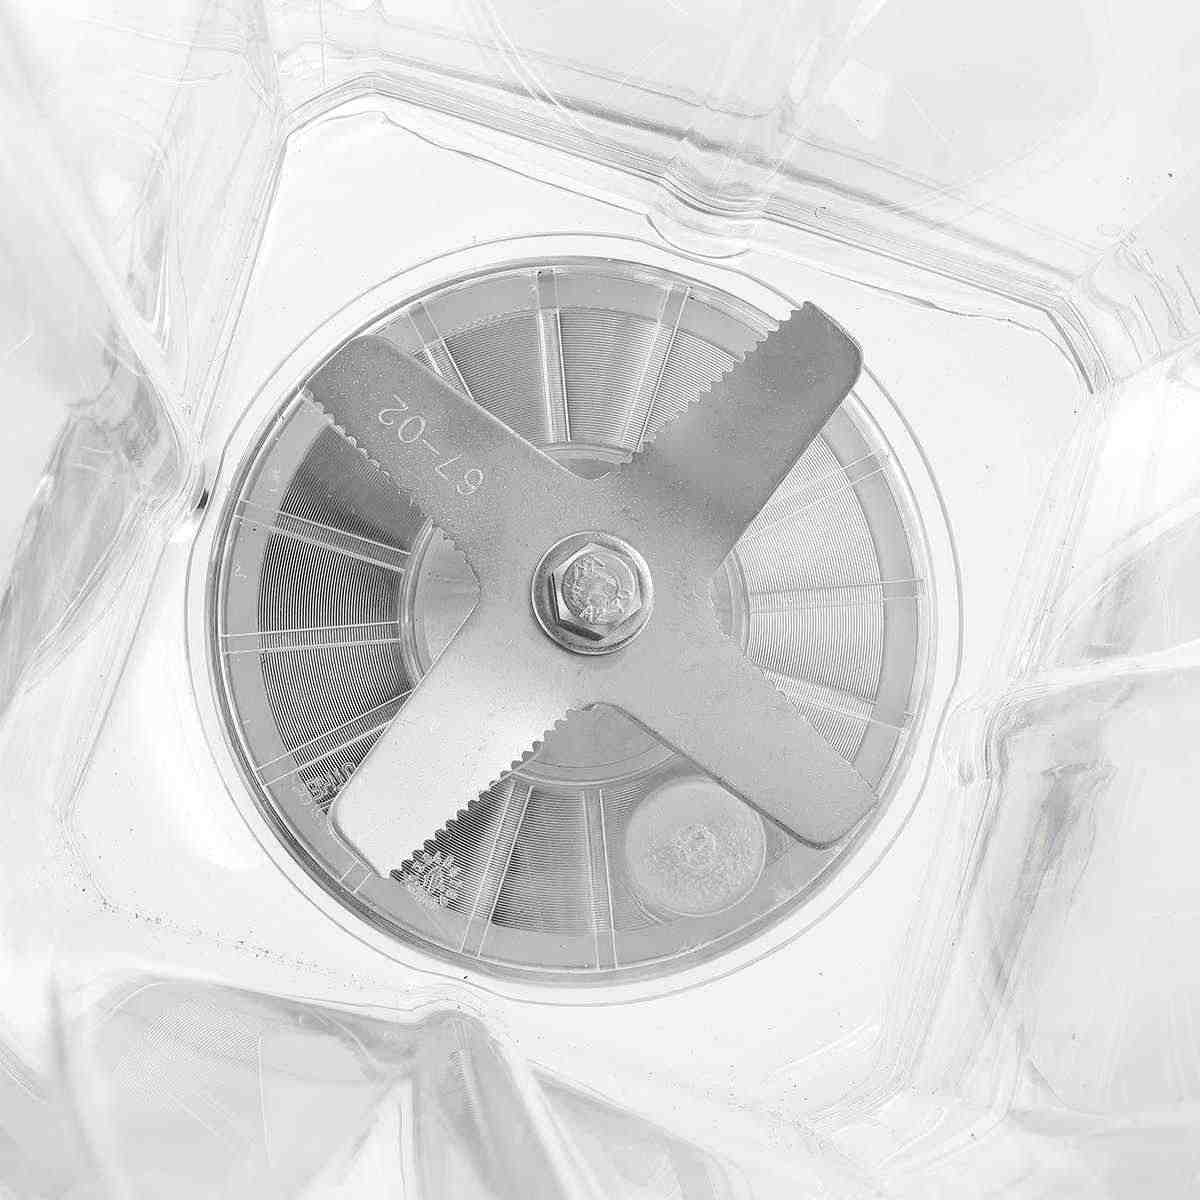 2L Recipiente Jarra Jarro Jarro De Copo Liquidificador Comercial/Peças De Reposição para o Vitamix 60 oz Home Kitchen Appliance Food Mixer parte Durável